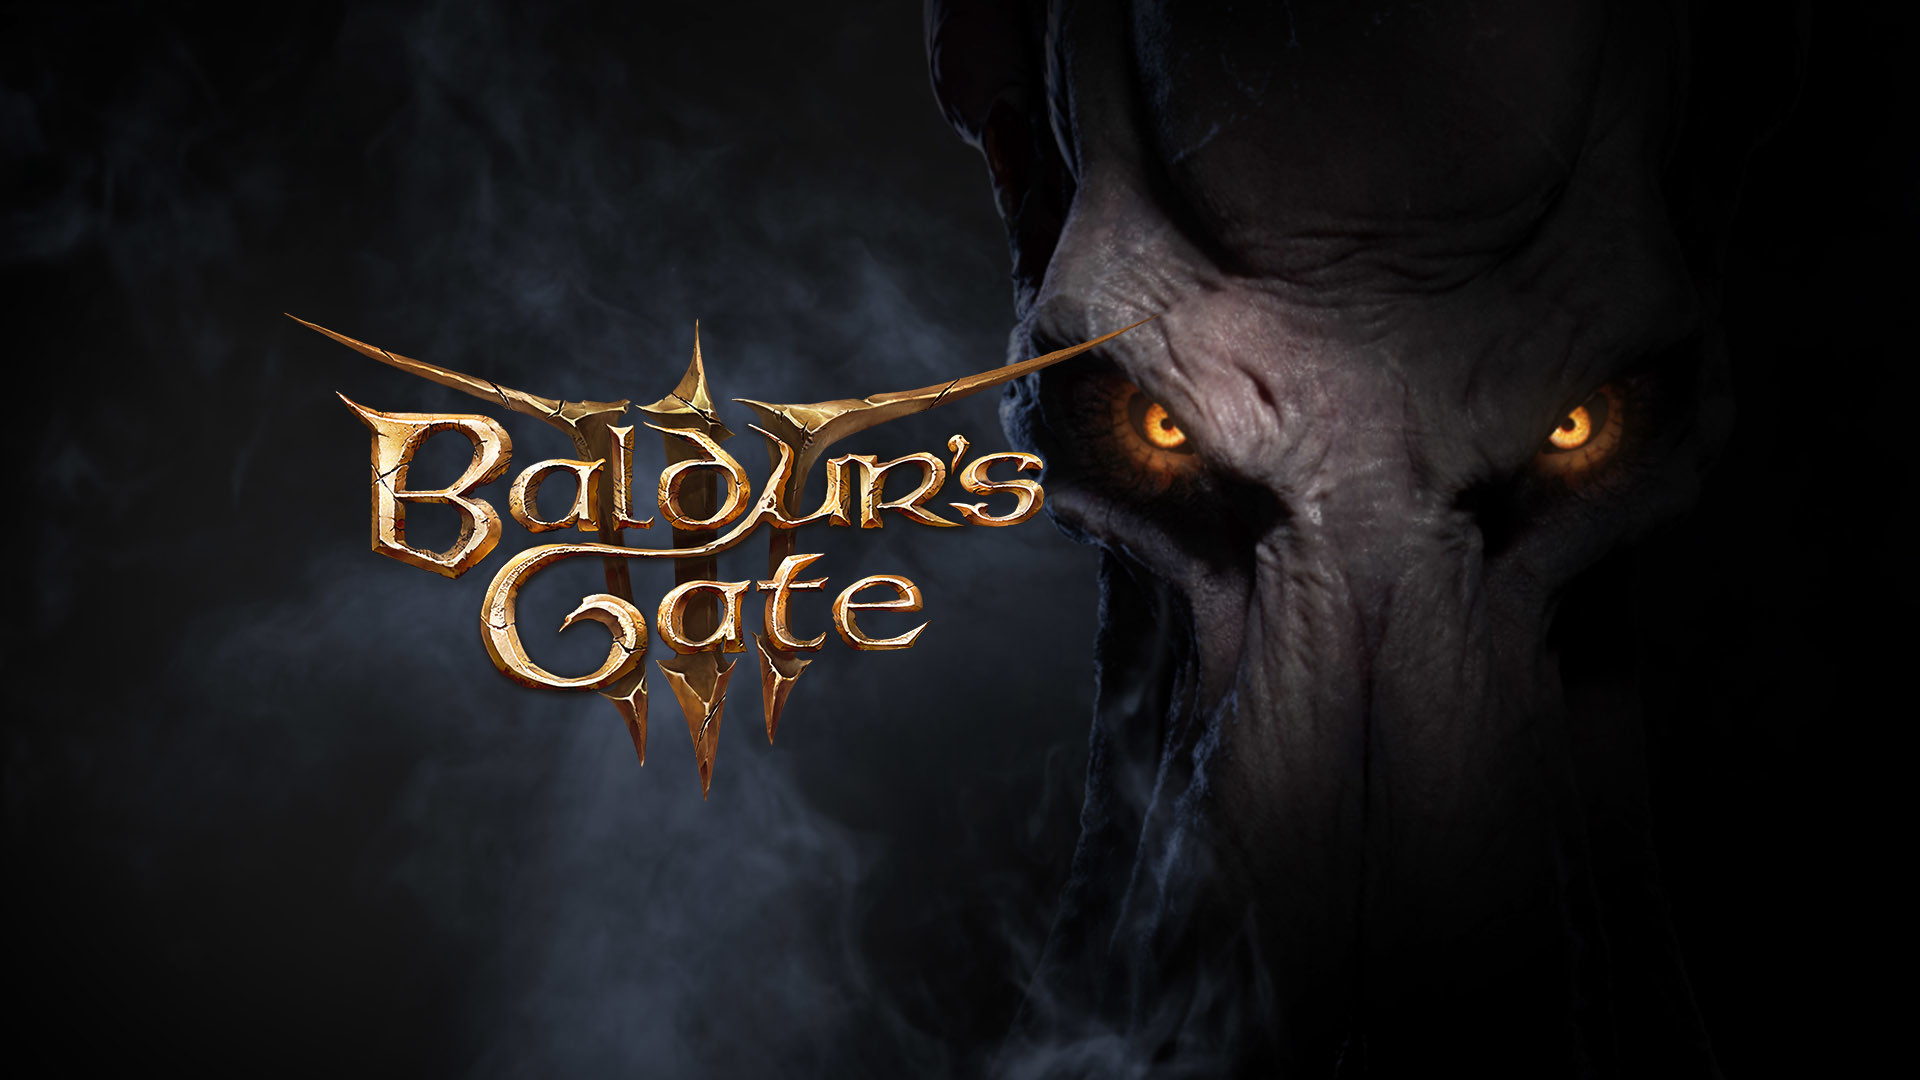 Baldur's Gate 3 - oficjalny gameplay już za kilka dni!